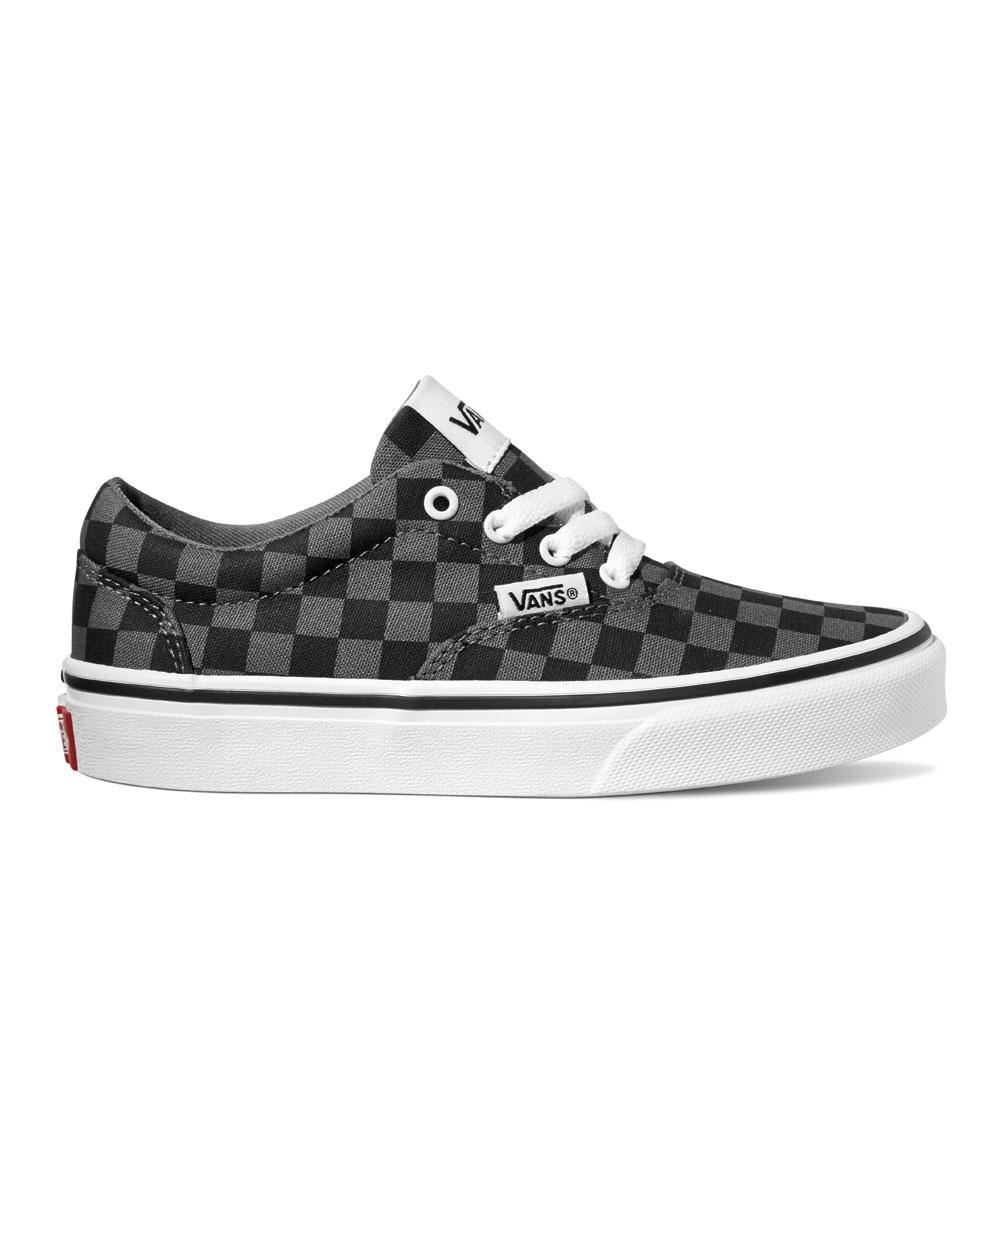 Vans Doheny Checkerboard (black/pewter